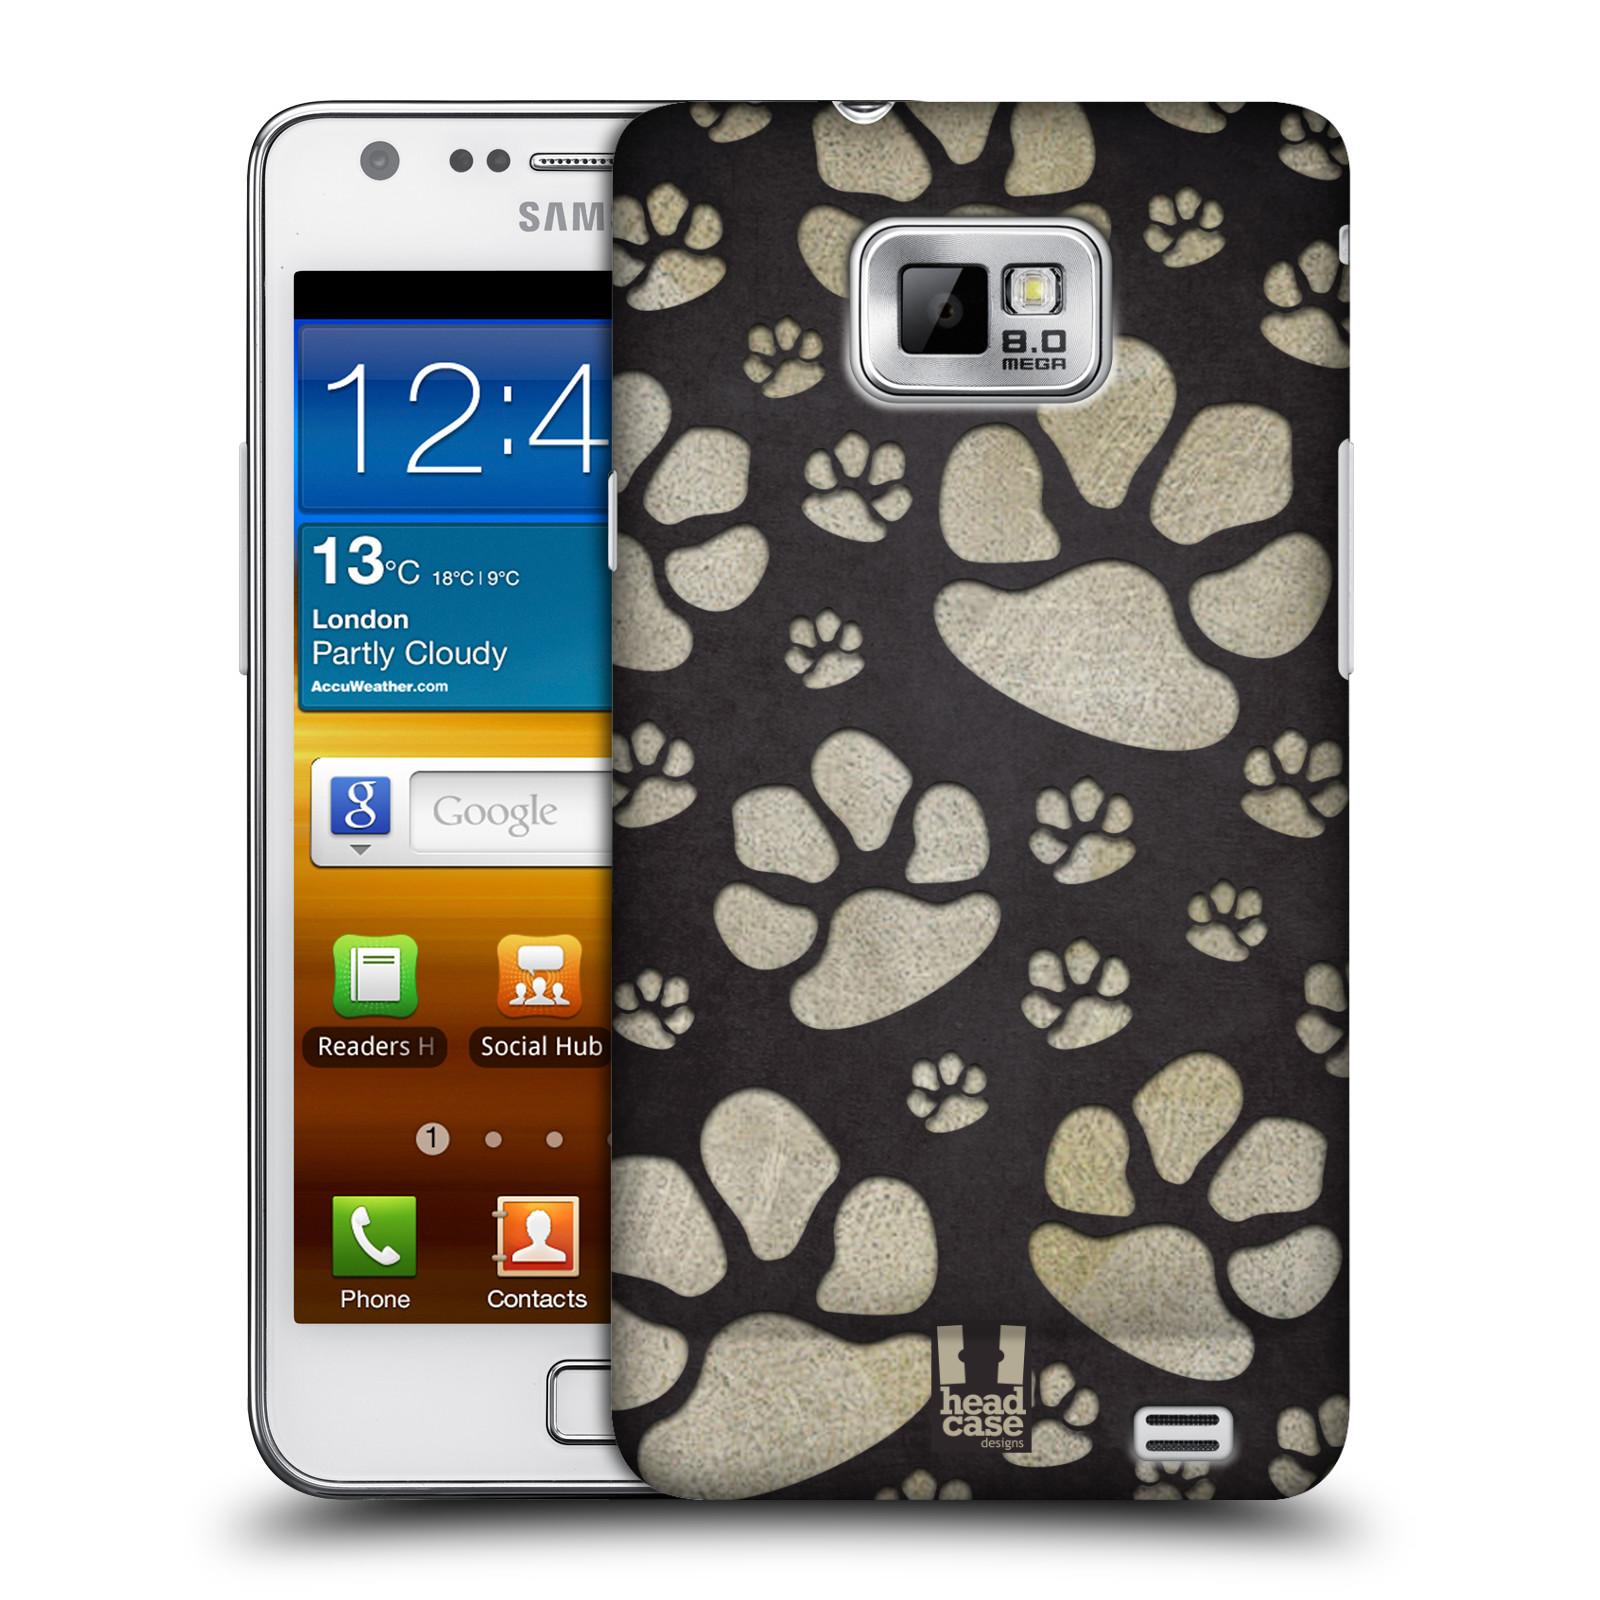 Plastové pouzdro na mobil Samsung Galaxy S II HEAD CASE TLAPKY ŠEDÉ (Kryt či obal na mobilní telefon Samsung Galaxy S II GT-i9100)